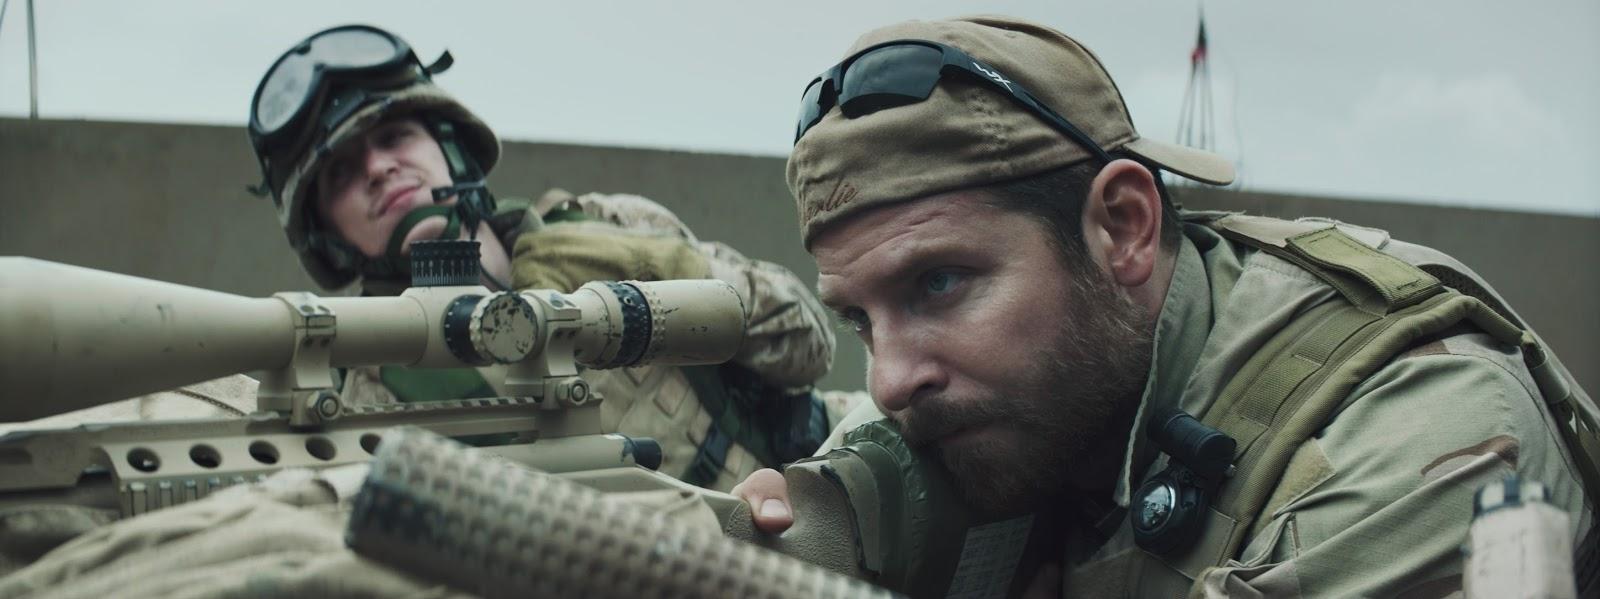 american sniper image film cinéma